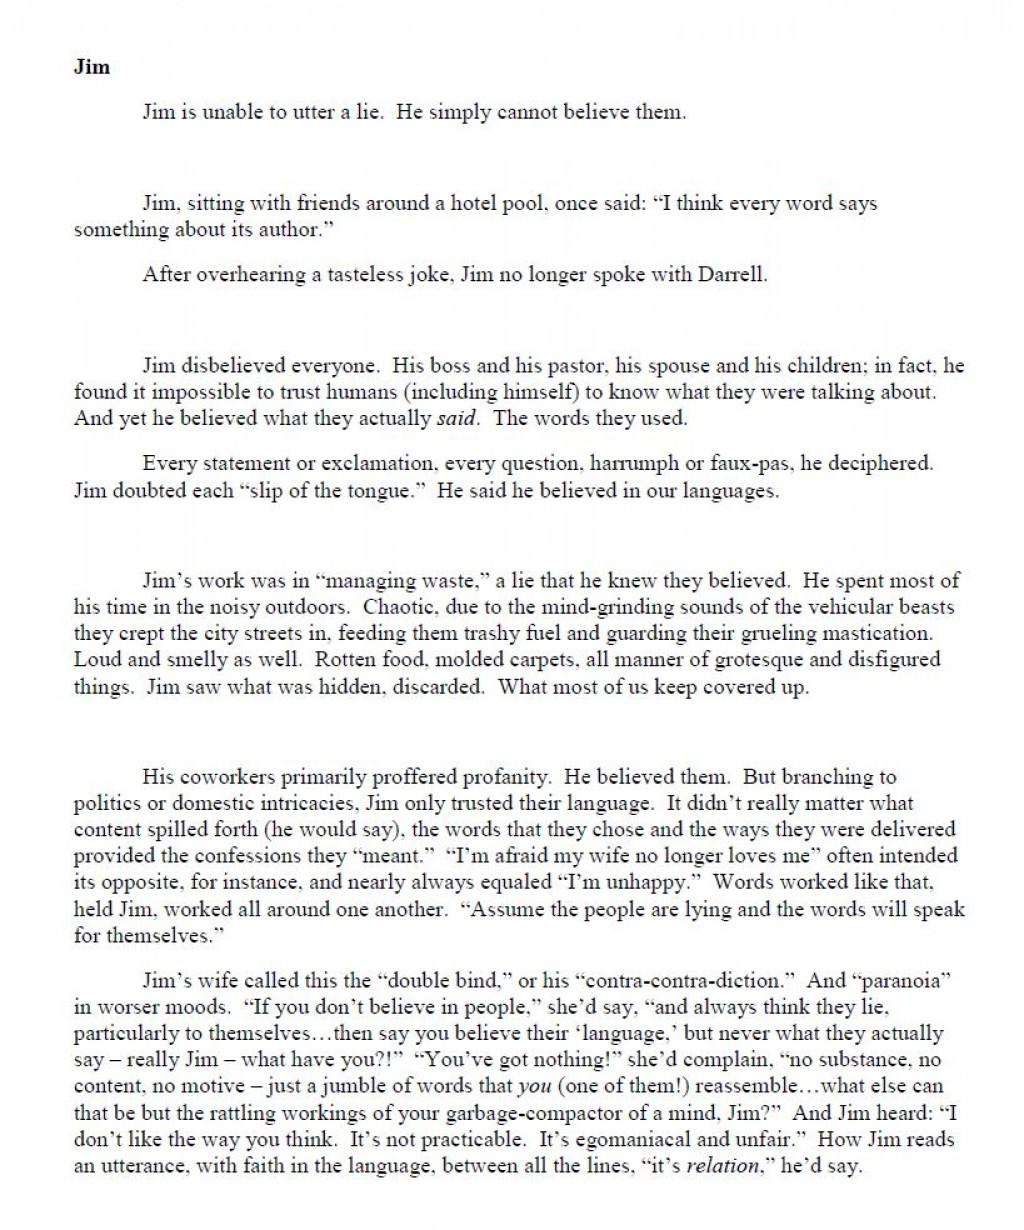 004 Essay Example Jim P1 Childhood Top Memory Ideas Earliest My Memories Large